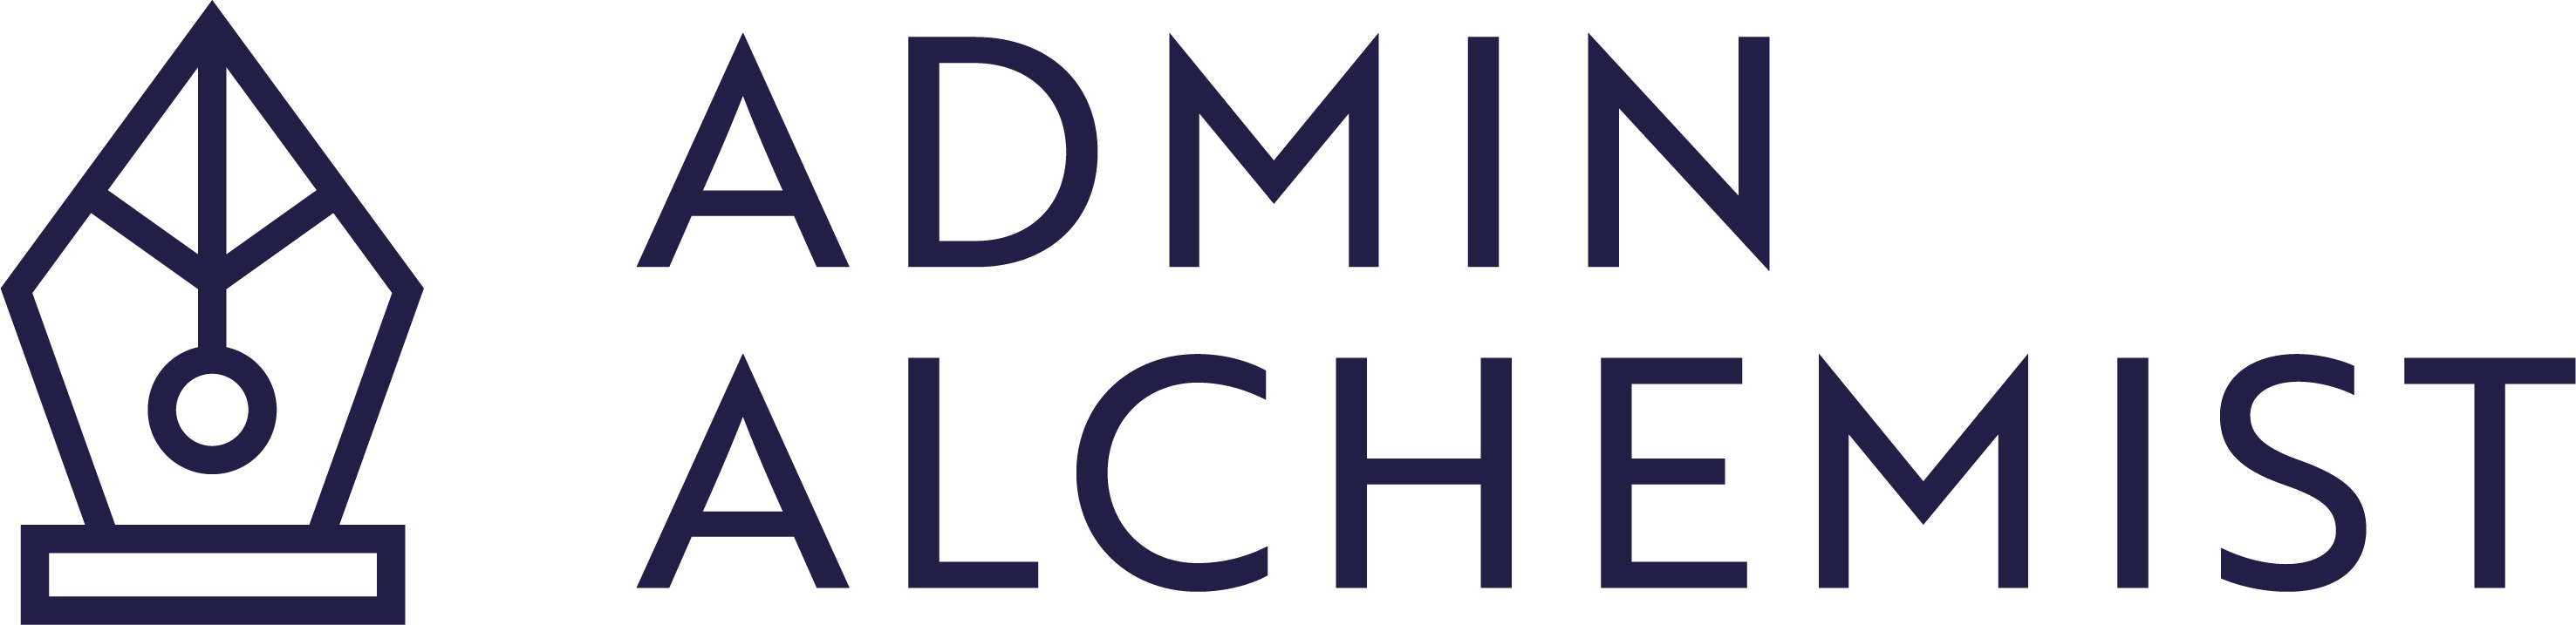 Admin Alchemist